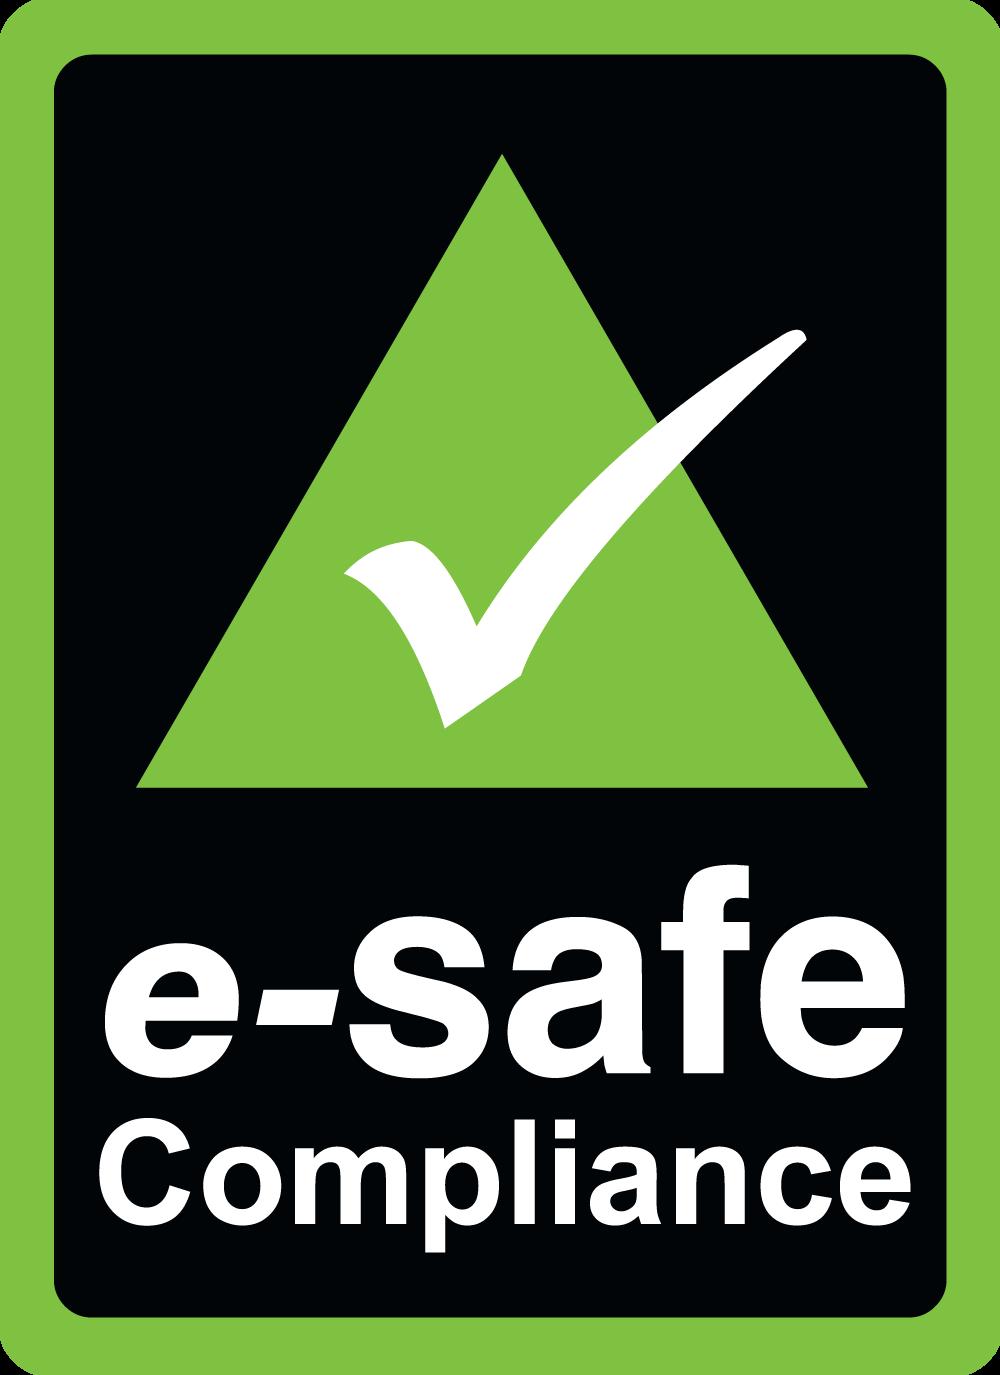 e-safe-compliance-Logo_1000.png